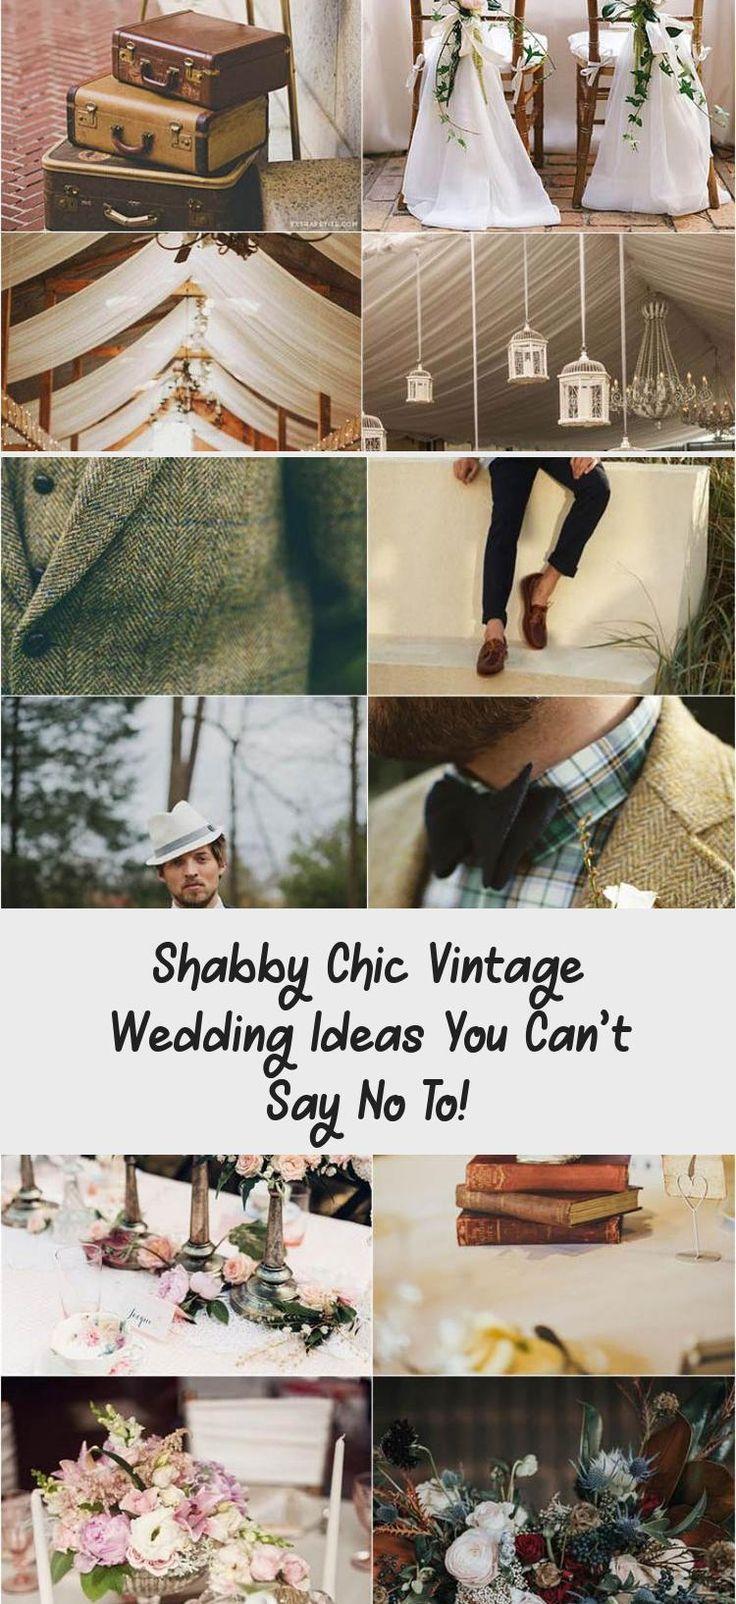 Shabby Chic Vintage Wedding Ideas You Can't Say No To!#weddingnight  #photooftheday    #Everything   #weddings   #lovehim #gardenweddingTableDecor #gardenweddingFlowers #gardenweddingSuit #Romanticgardenwedding #gardenweddingDress